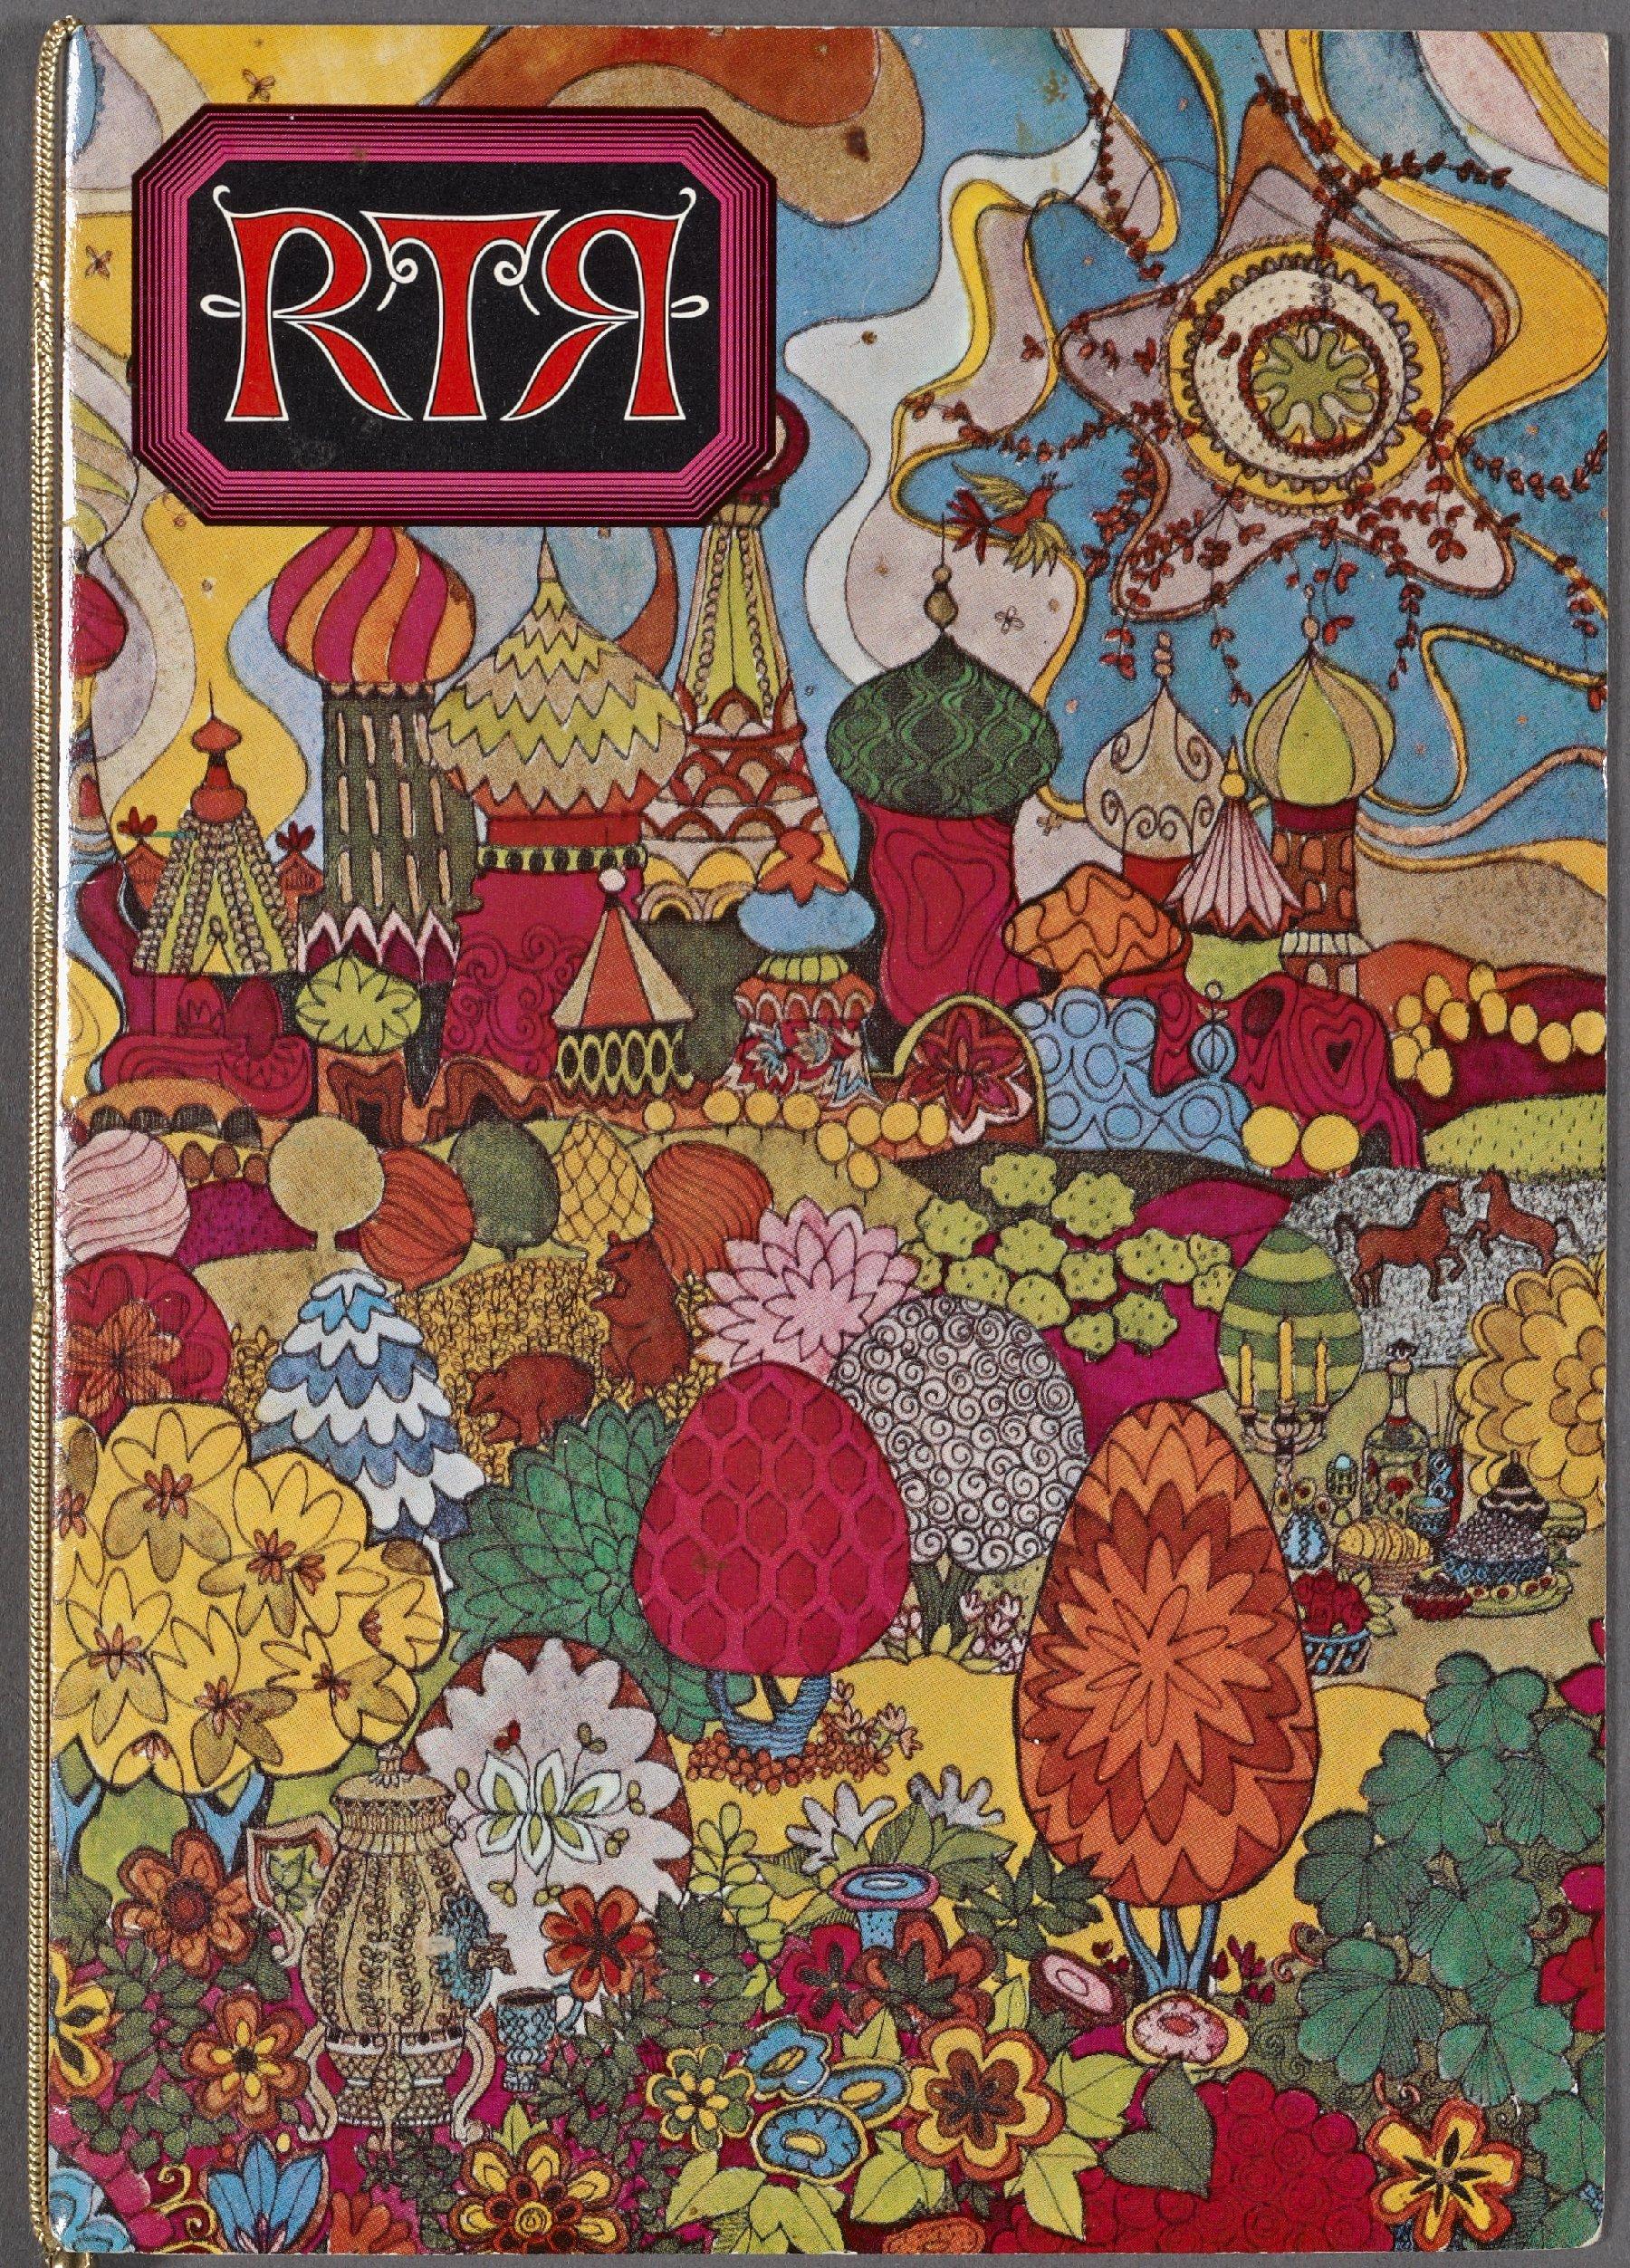 The Russian Tea Room menu from 1976